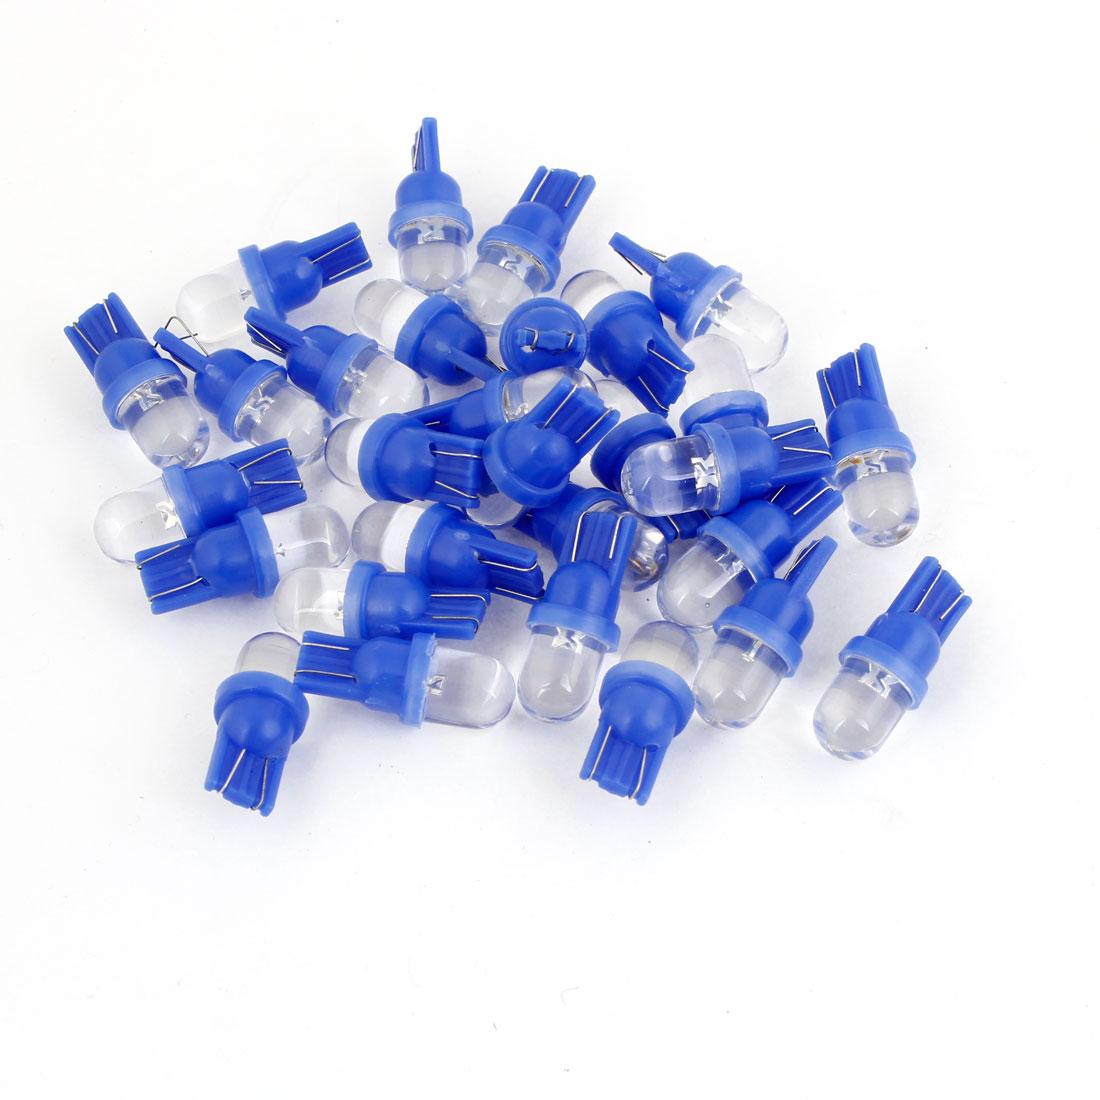 30 Pcs Spare Parts Blue T10 W5W LED Lamp Dashboard Light Bulb for Car internal